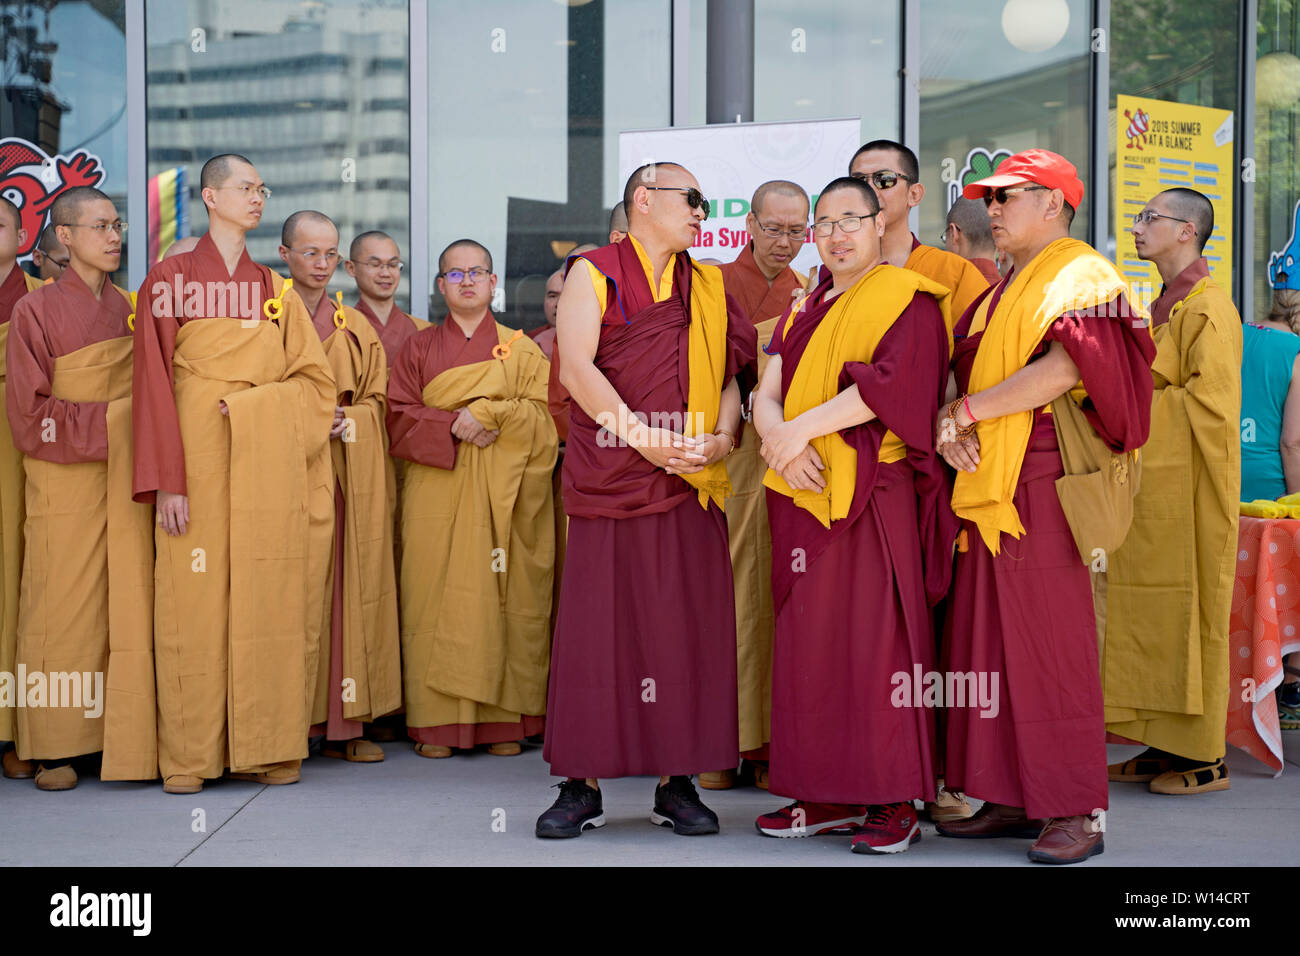 Buddhist Monks gathered for Vesak Celebration of Buddha's Birthday, Mississauga Ontario Canada, 26 May 2019 - Stock Image